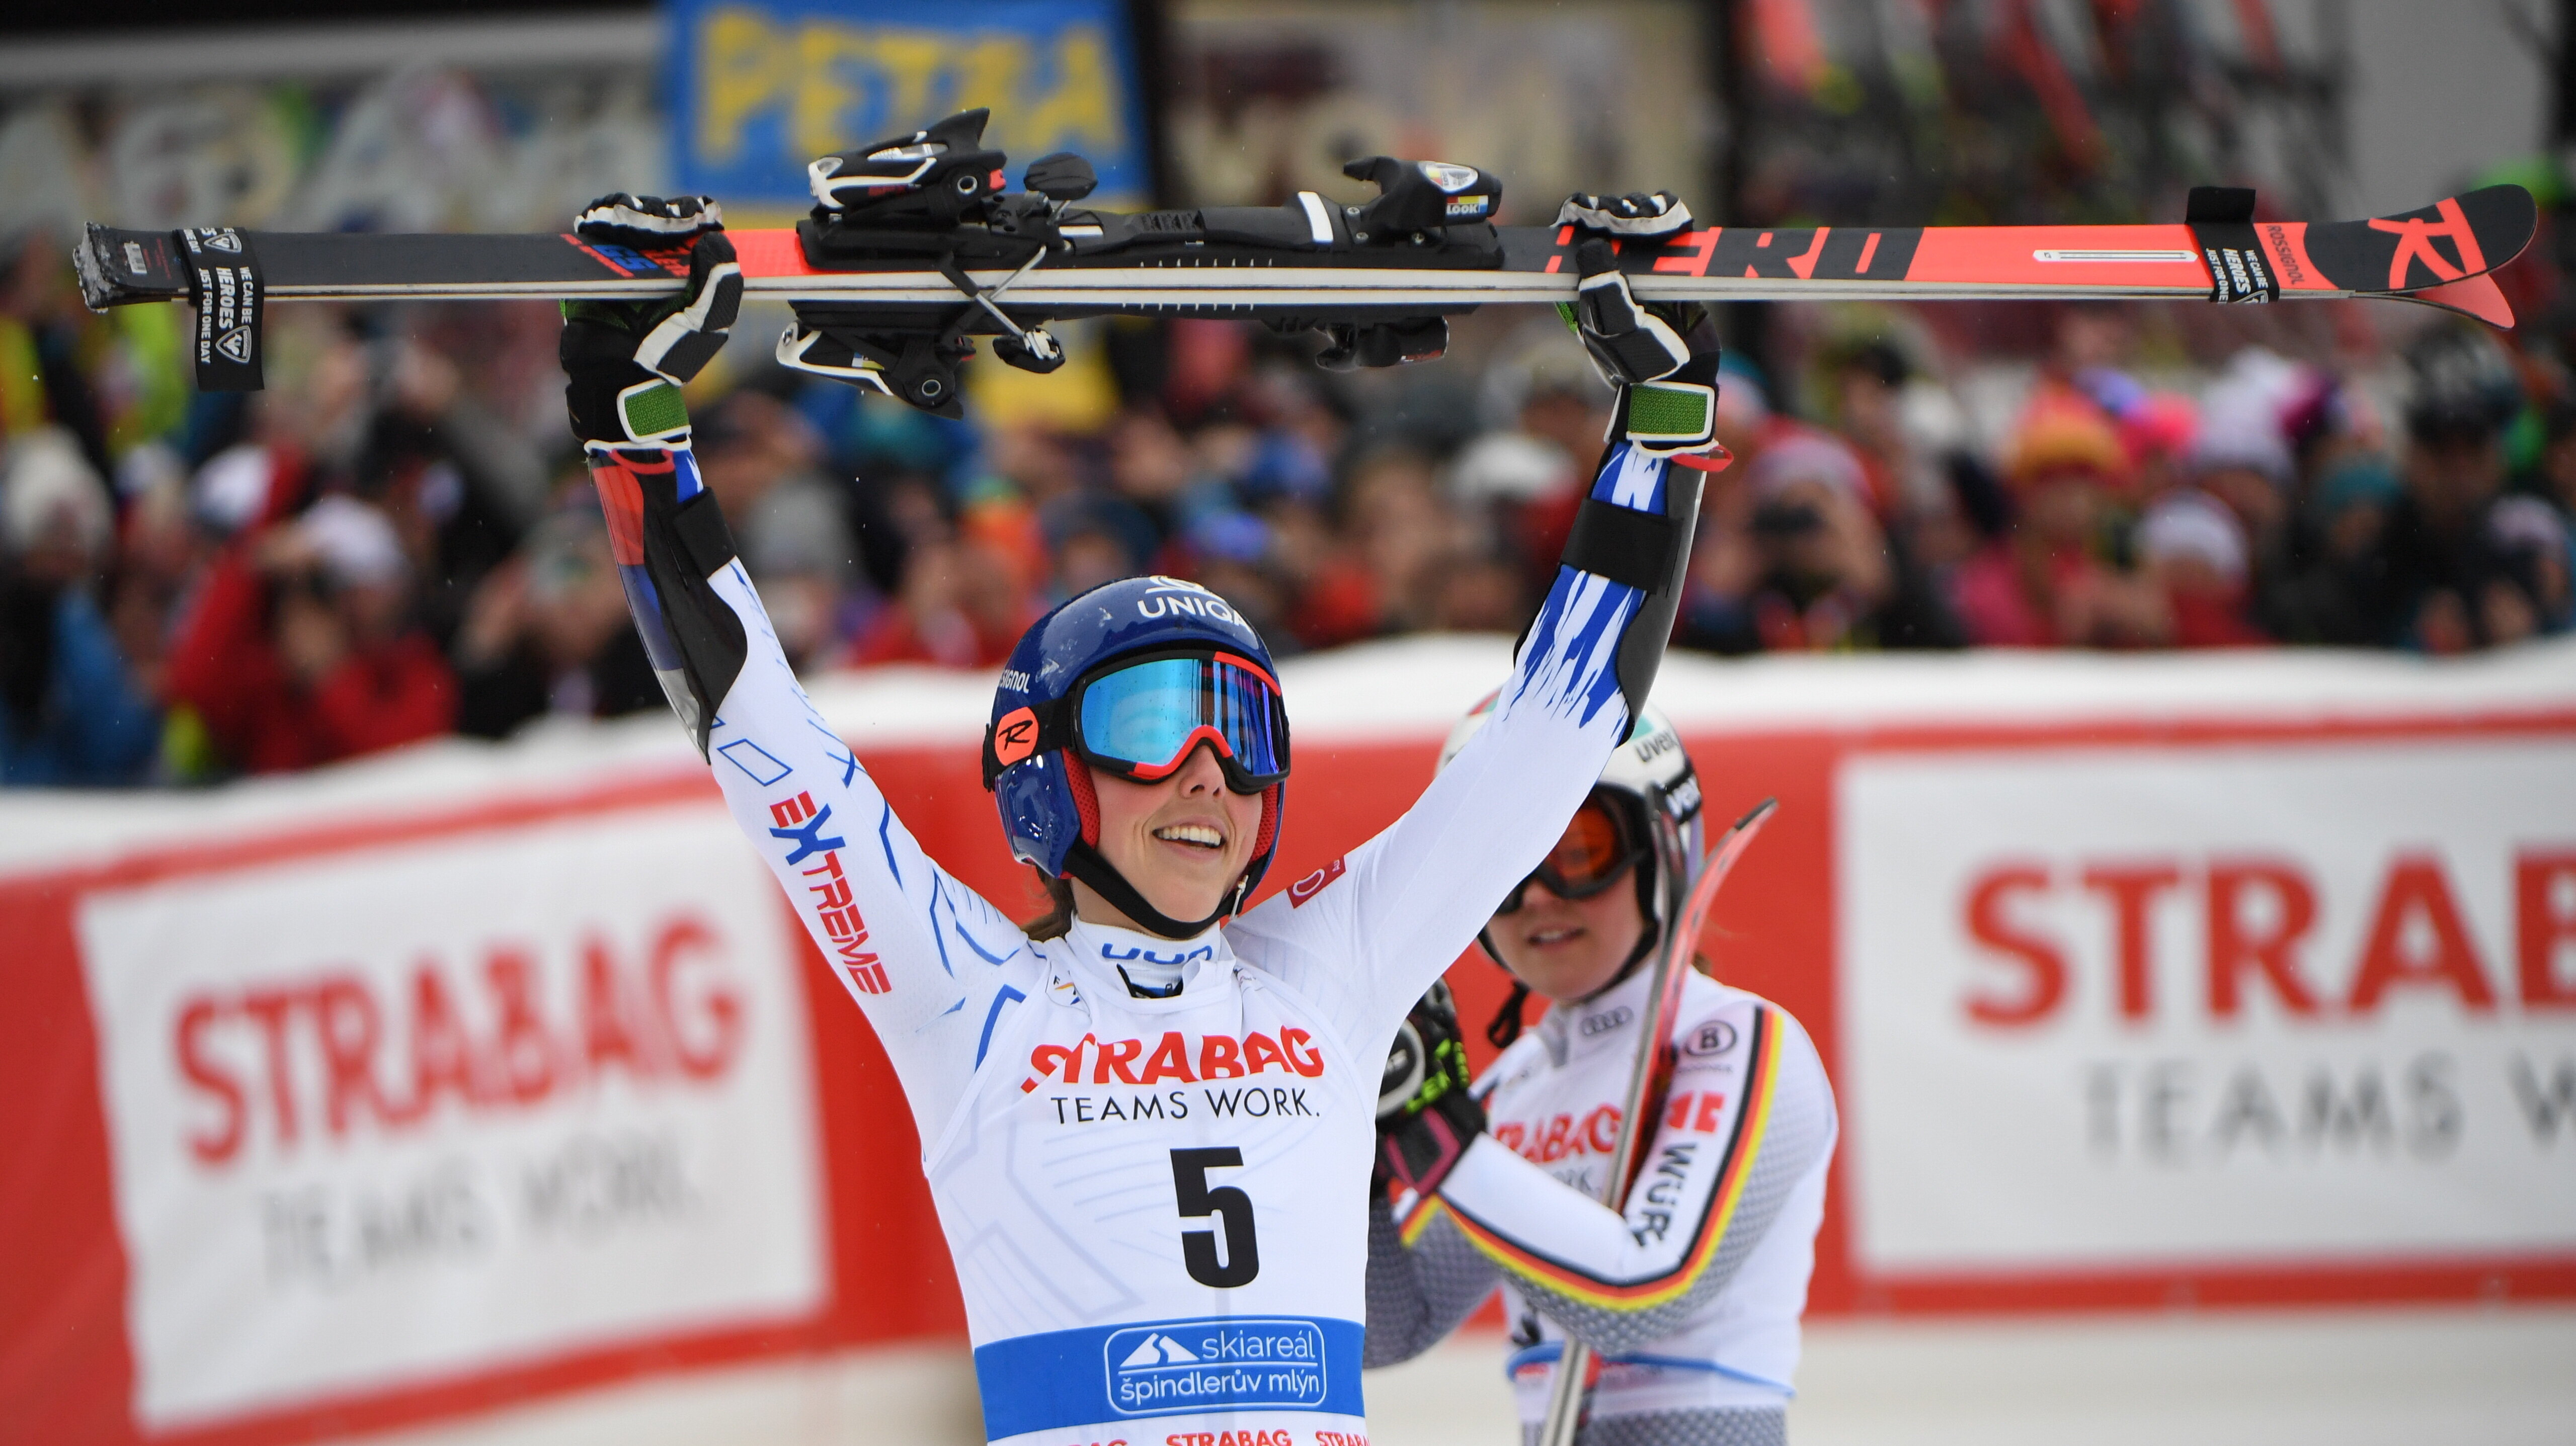 da7f9e35d ONLINE: Obr. slalom, Špindlerov Mlyn - 2. kolo (Vlhová) - Šport SME